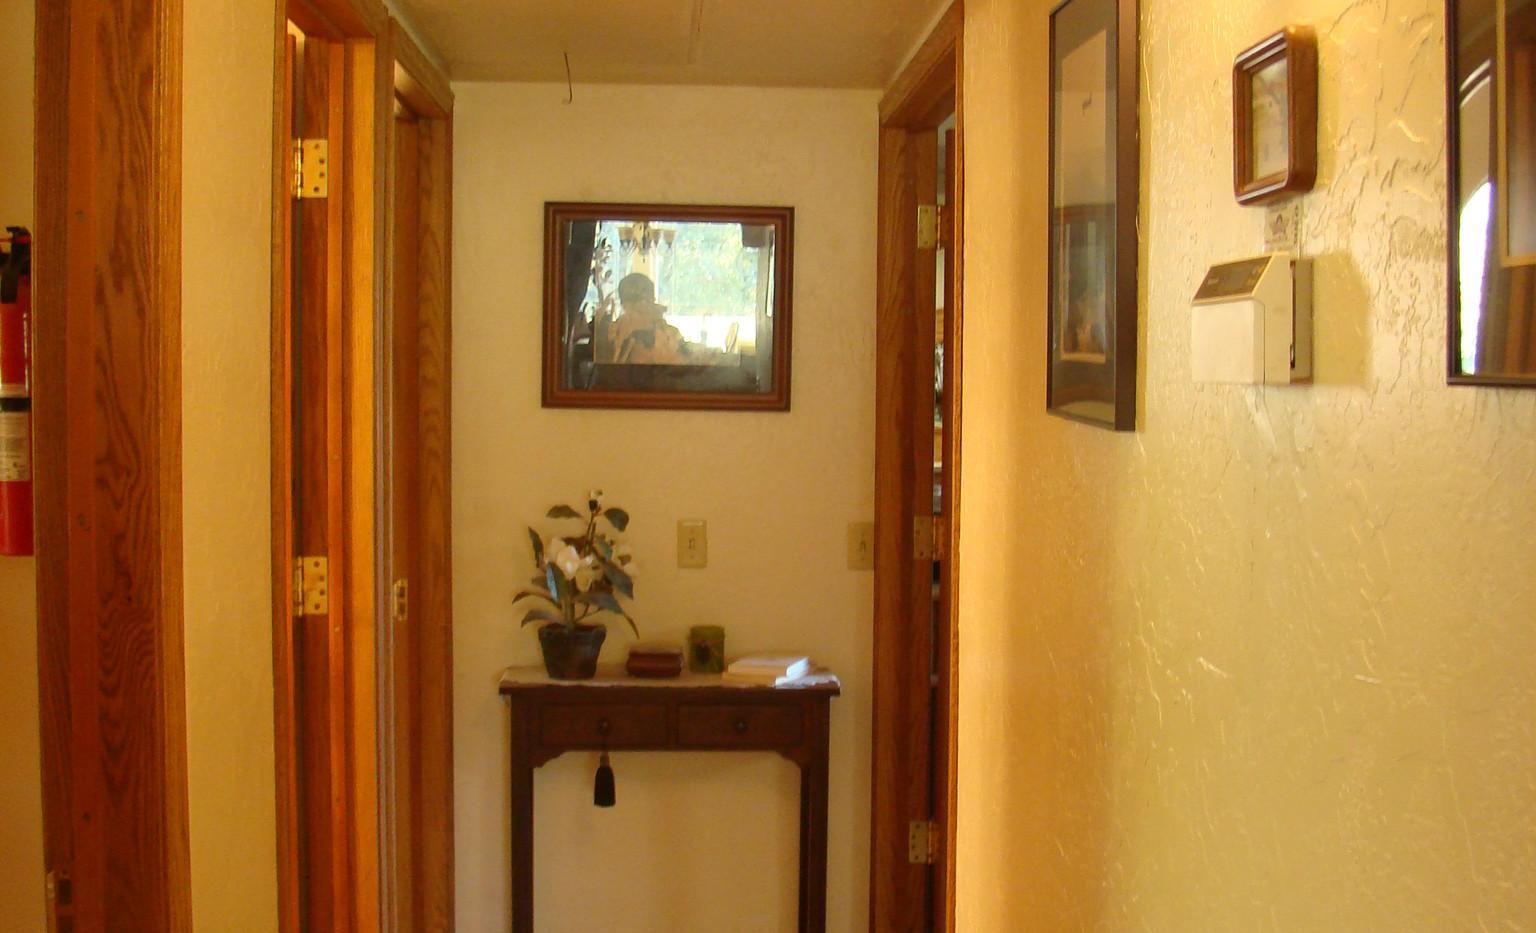 John_s house 034 hallway.JPG